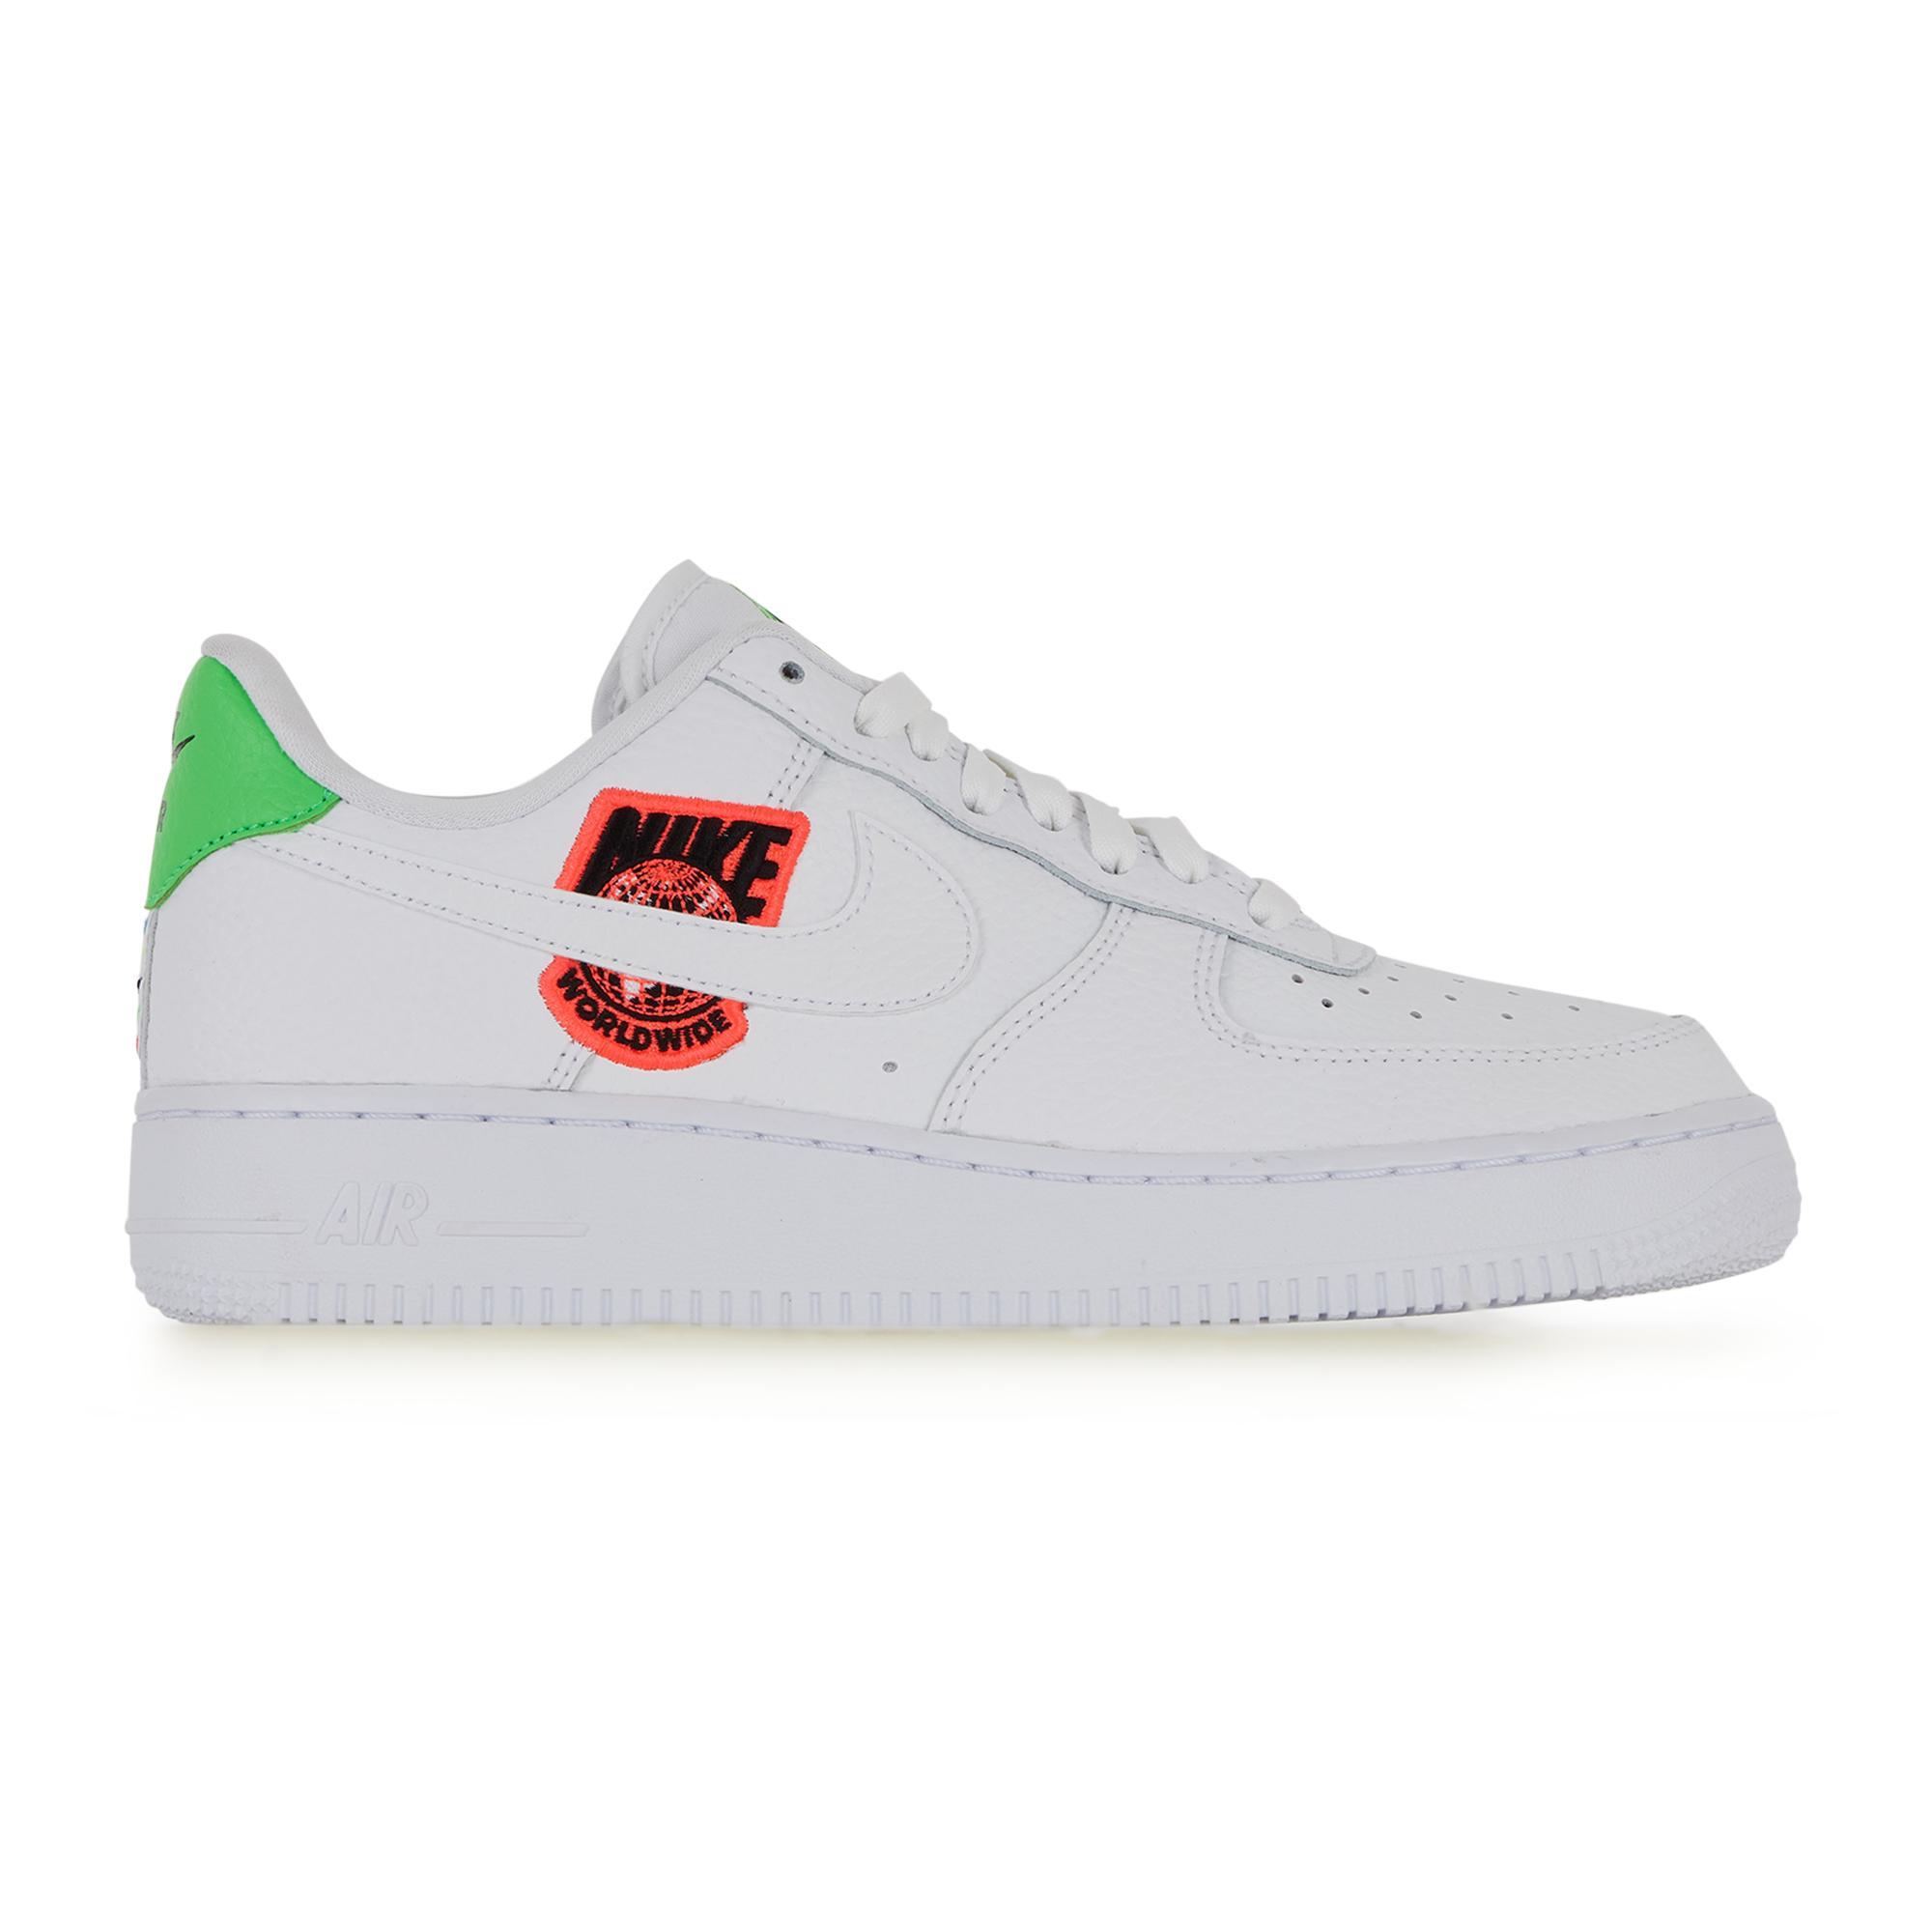 Air force 1 low ww Nike - Lyst